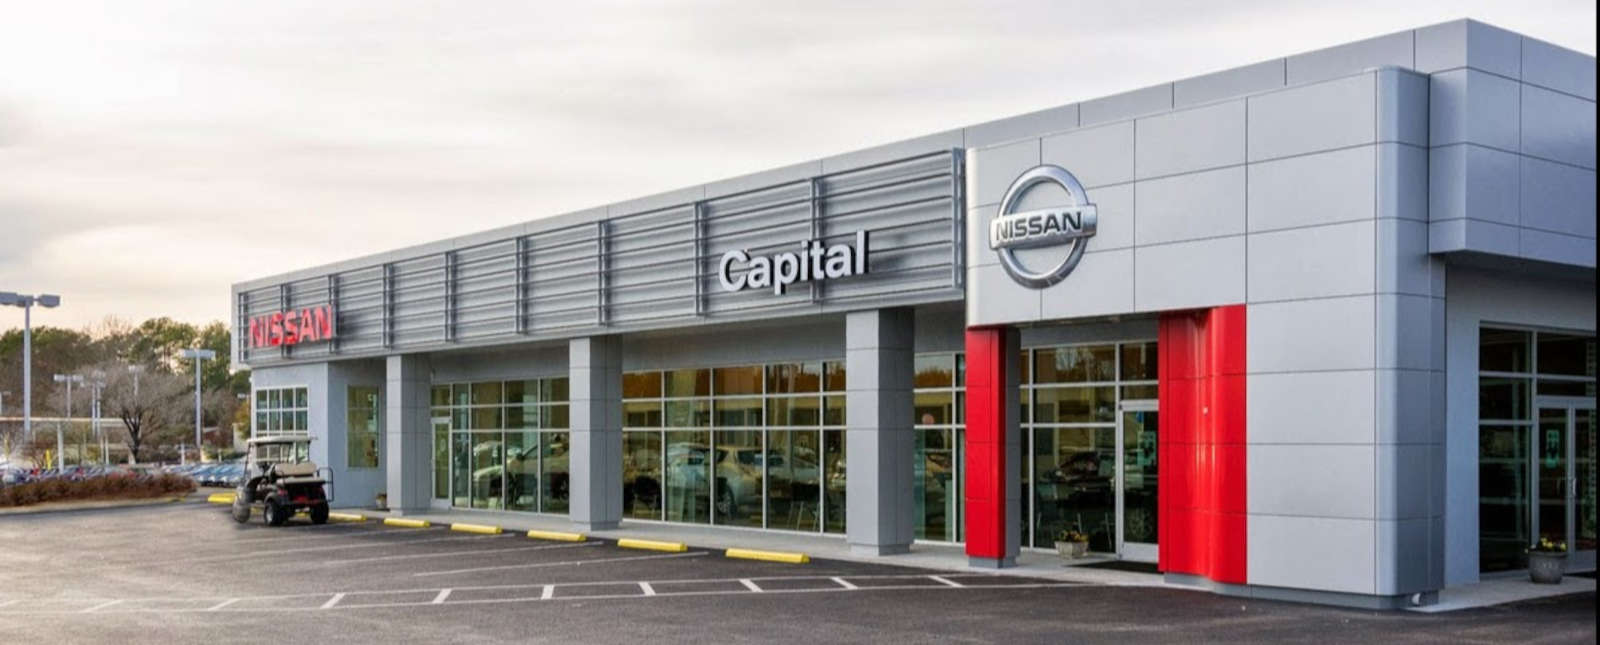 Capital Nissan Dealership located in North Carolina